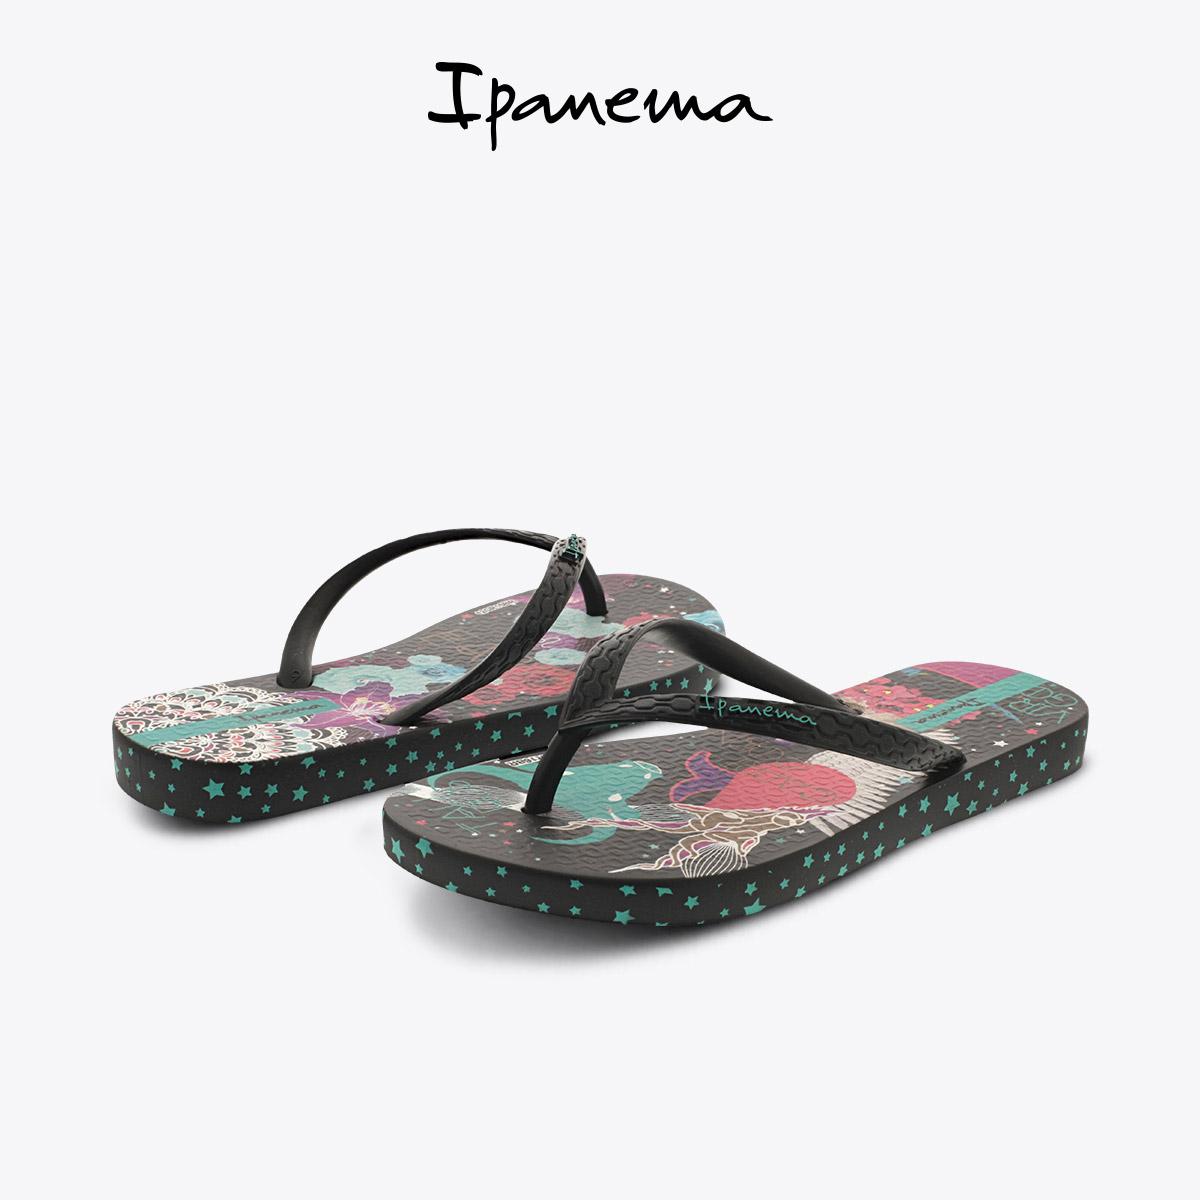 ipanema 夏季新款星象V系列印花夹趾成人儿童女亲子鞋 人字拖潮